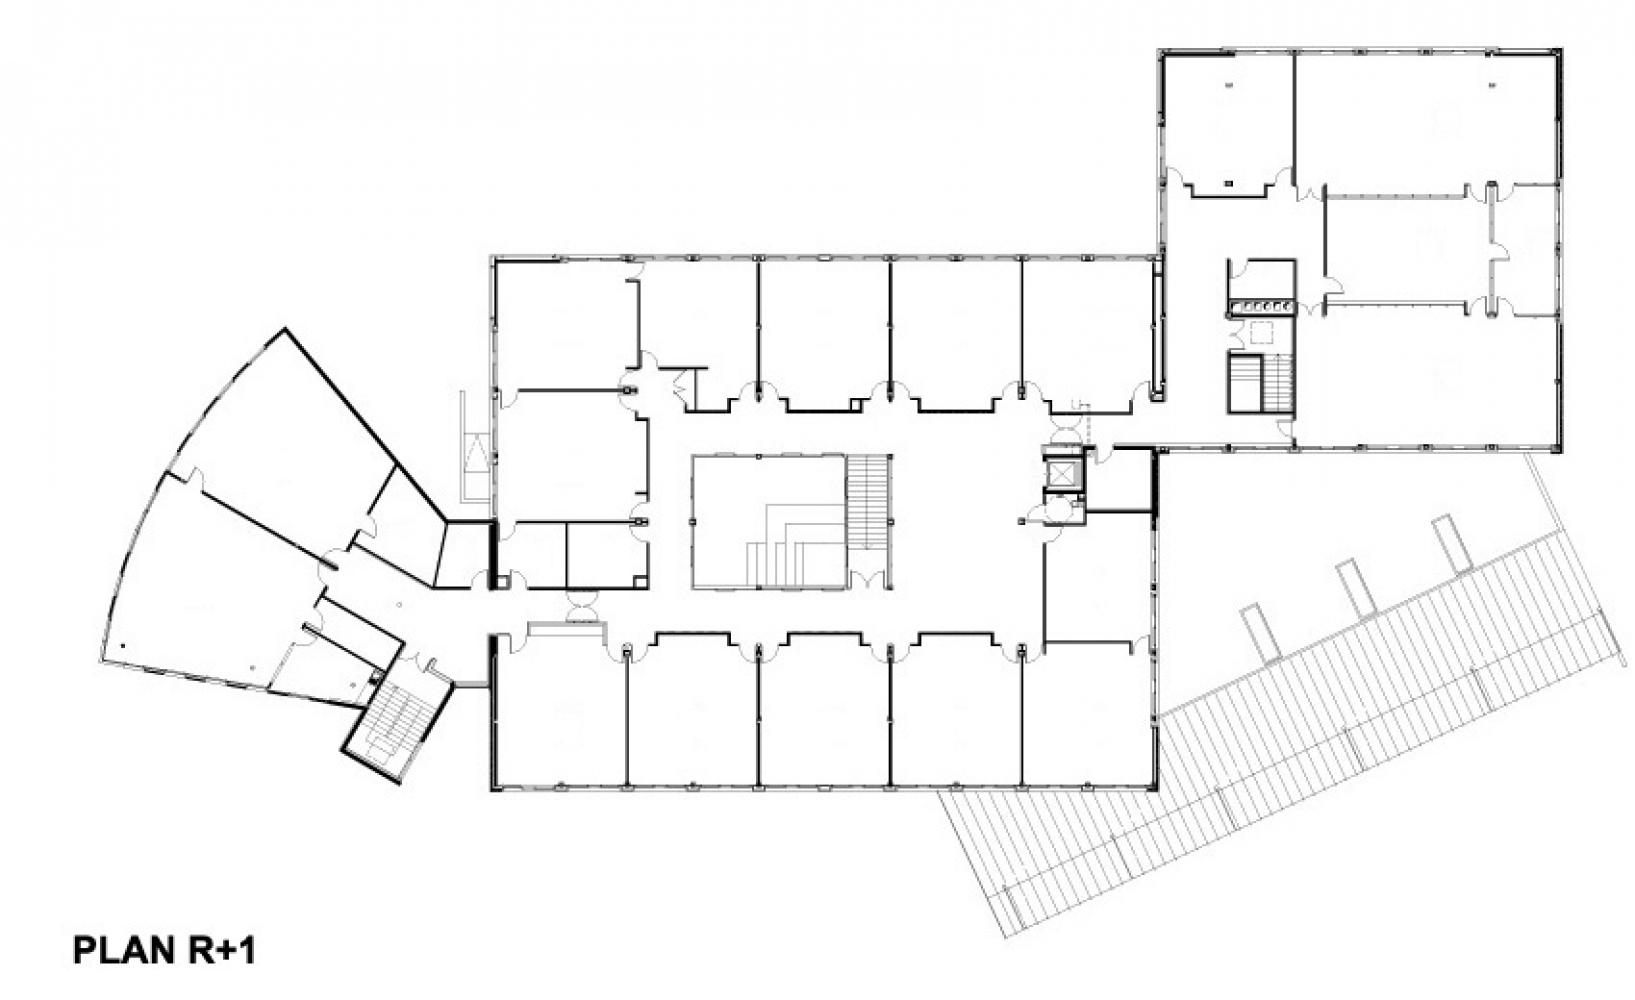 zligu---04 Pascale SEURIN Architecte - Pascale SEURIN Architecte